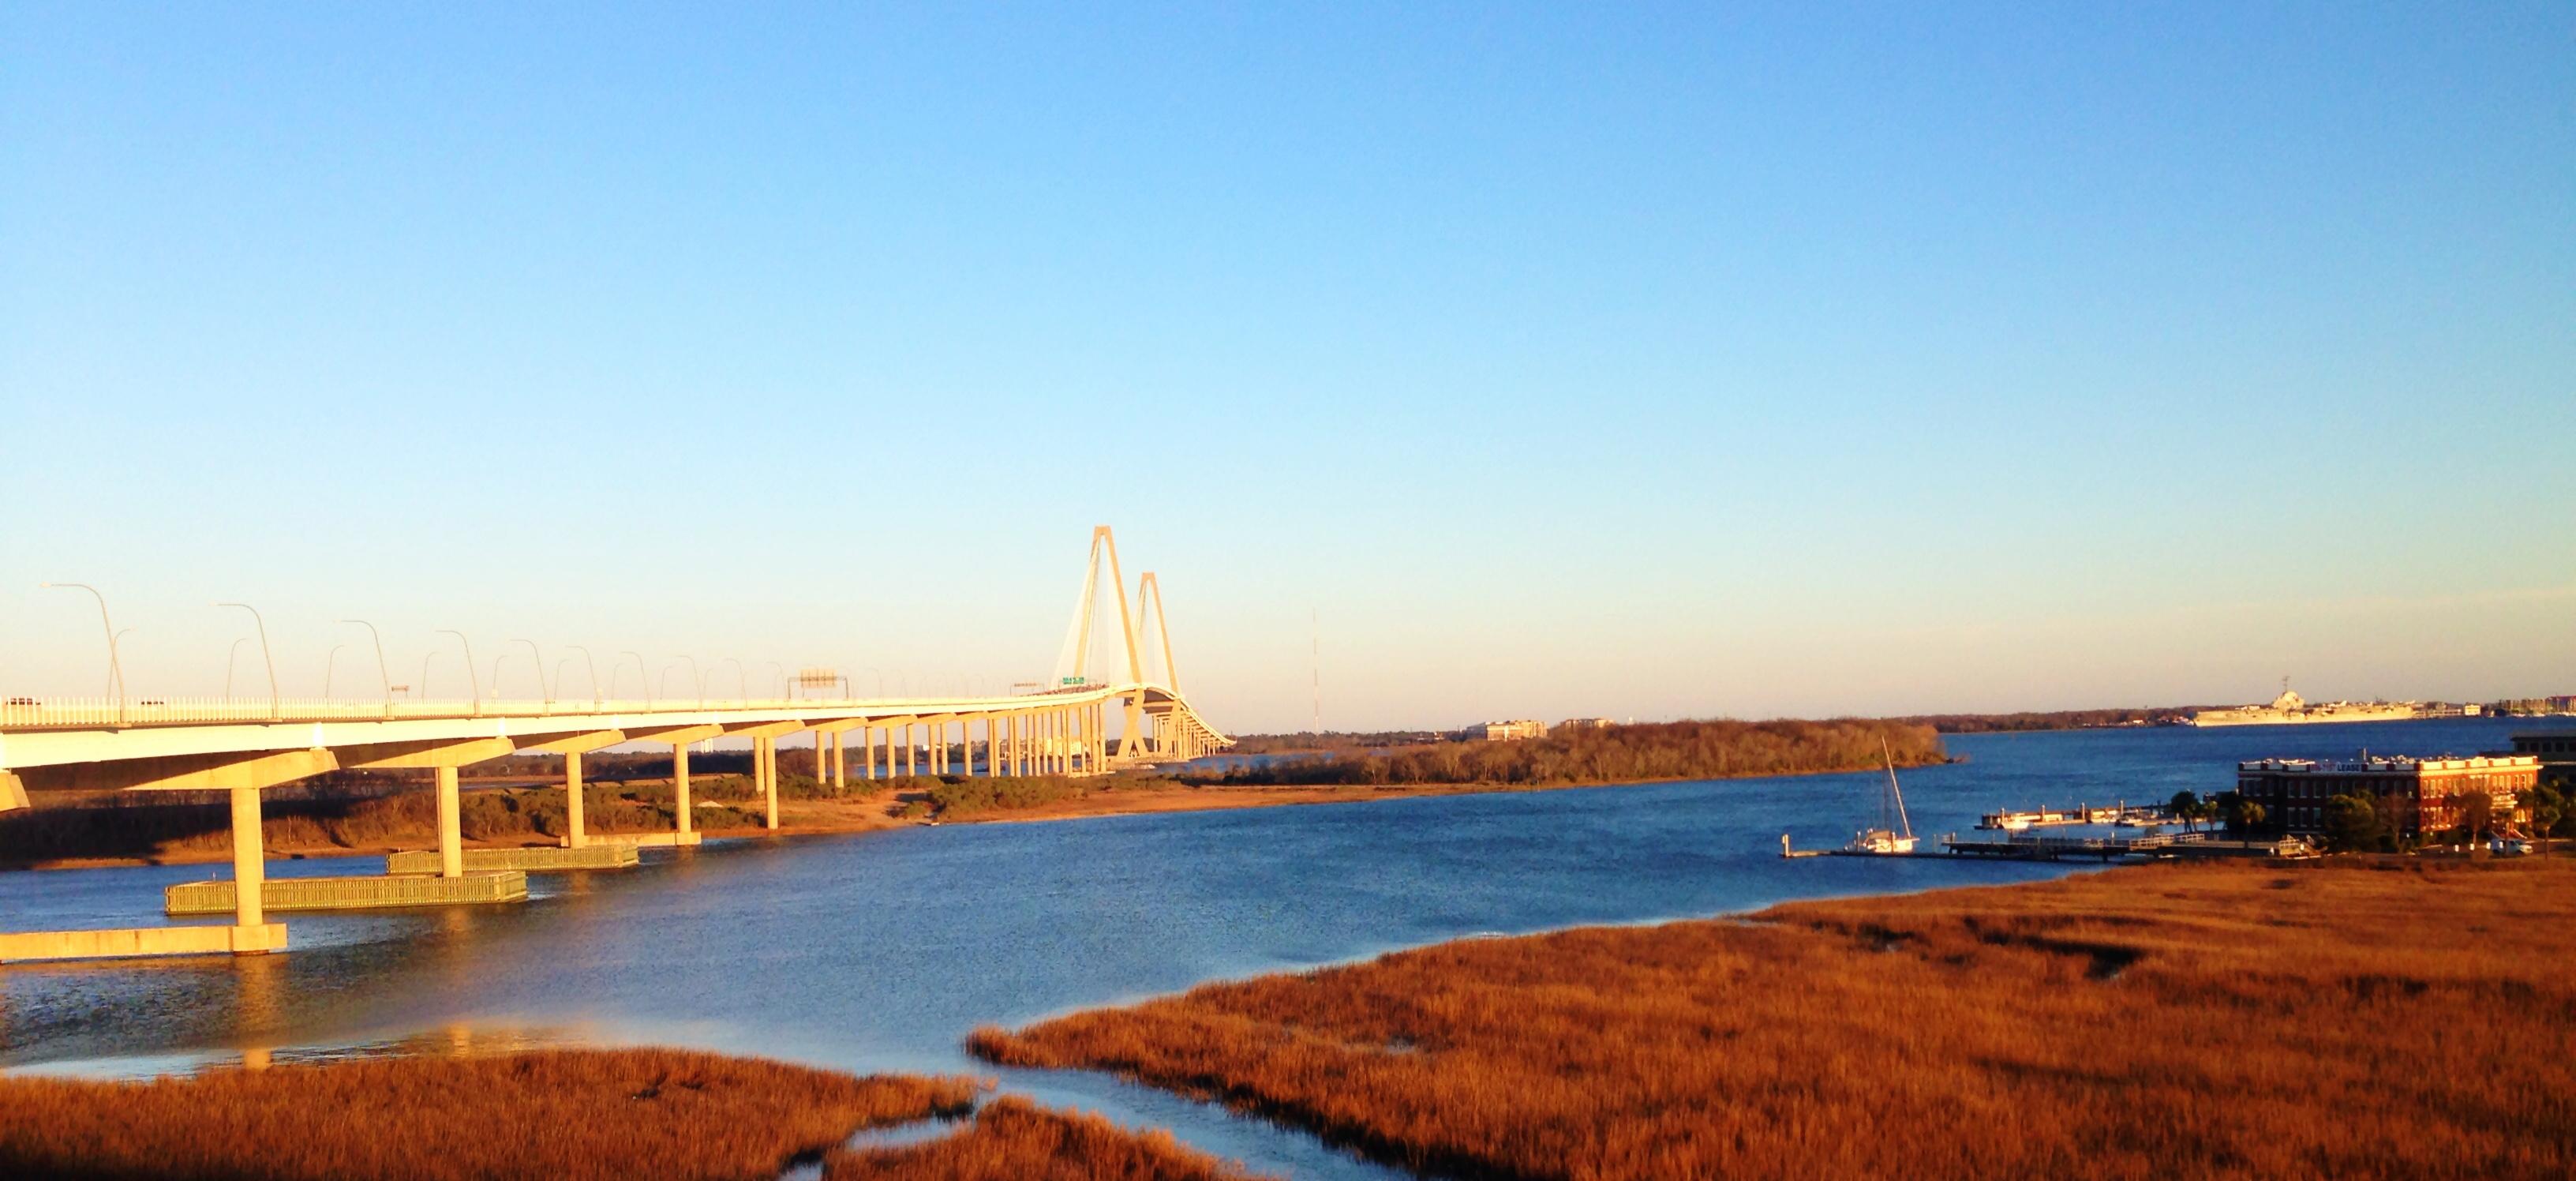 ravenel bridge Outdoor activities things to do Charleston